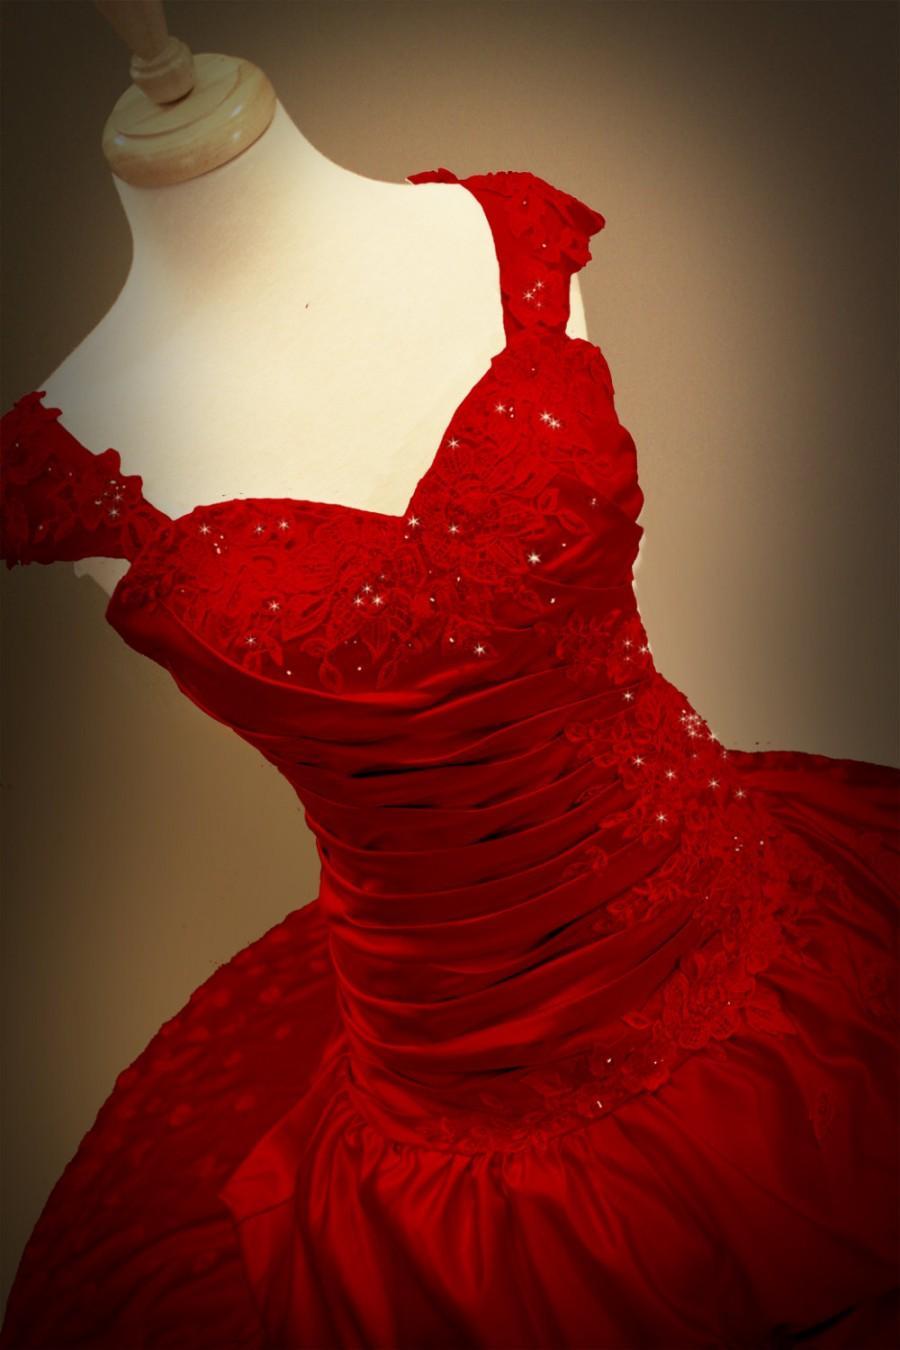 Dress - Red Gothic Wedding Dress Ball Gown #2611363 - Weddbook